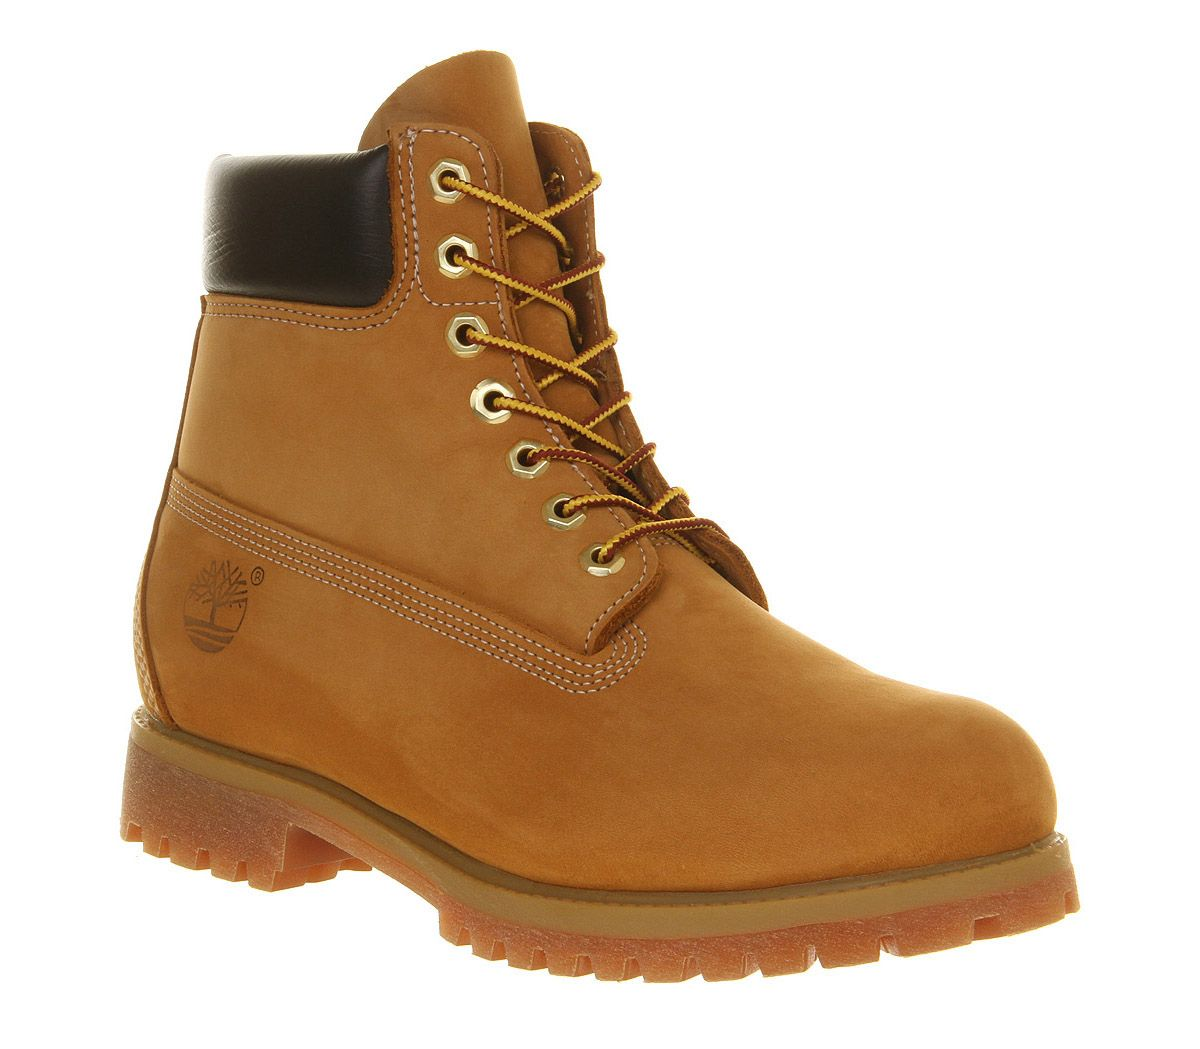 65434339b46f Timberland 6 Inch Buck Boots Wheat Nubuck - Boots